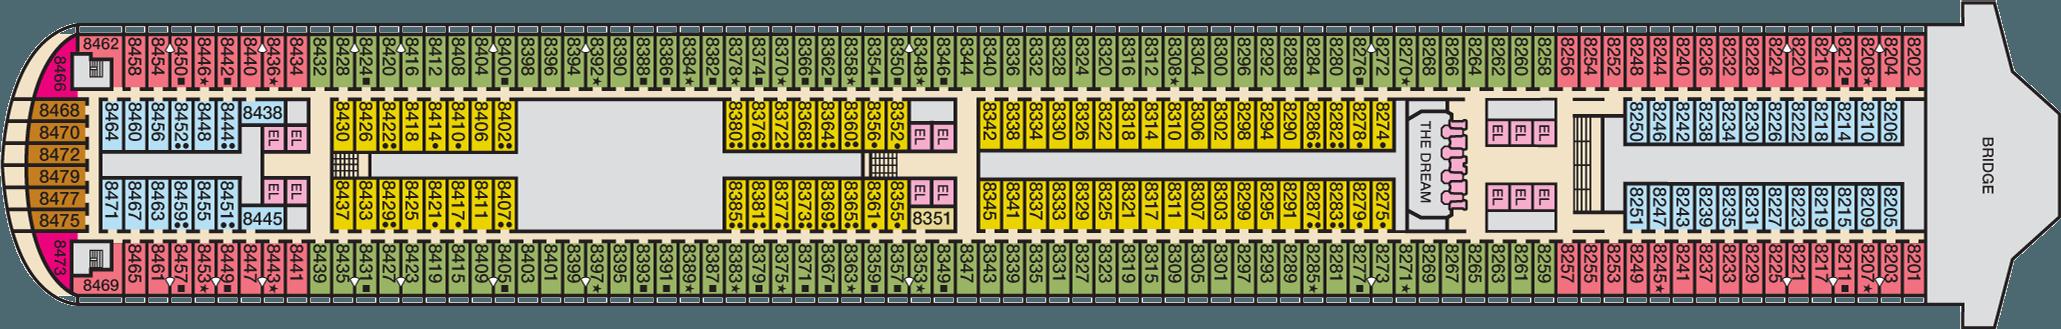 Deck 8 Veranda